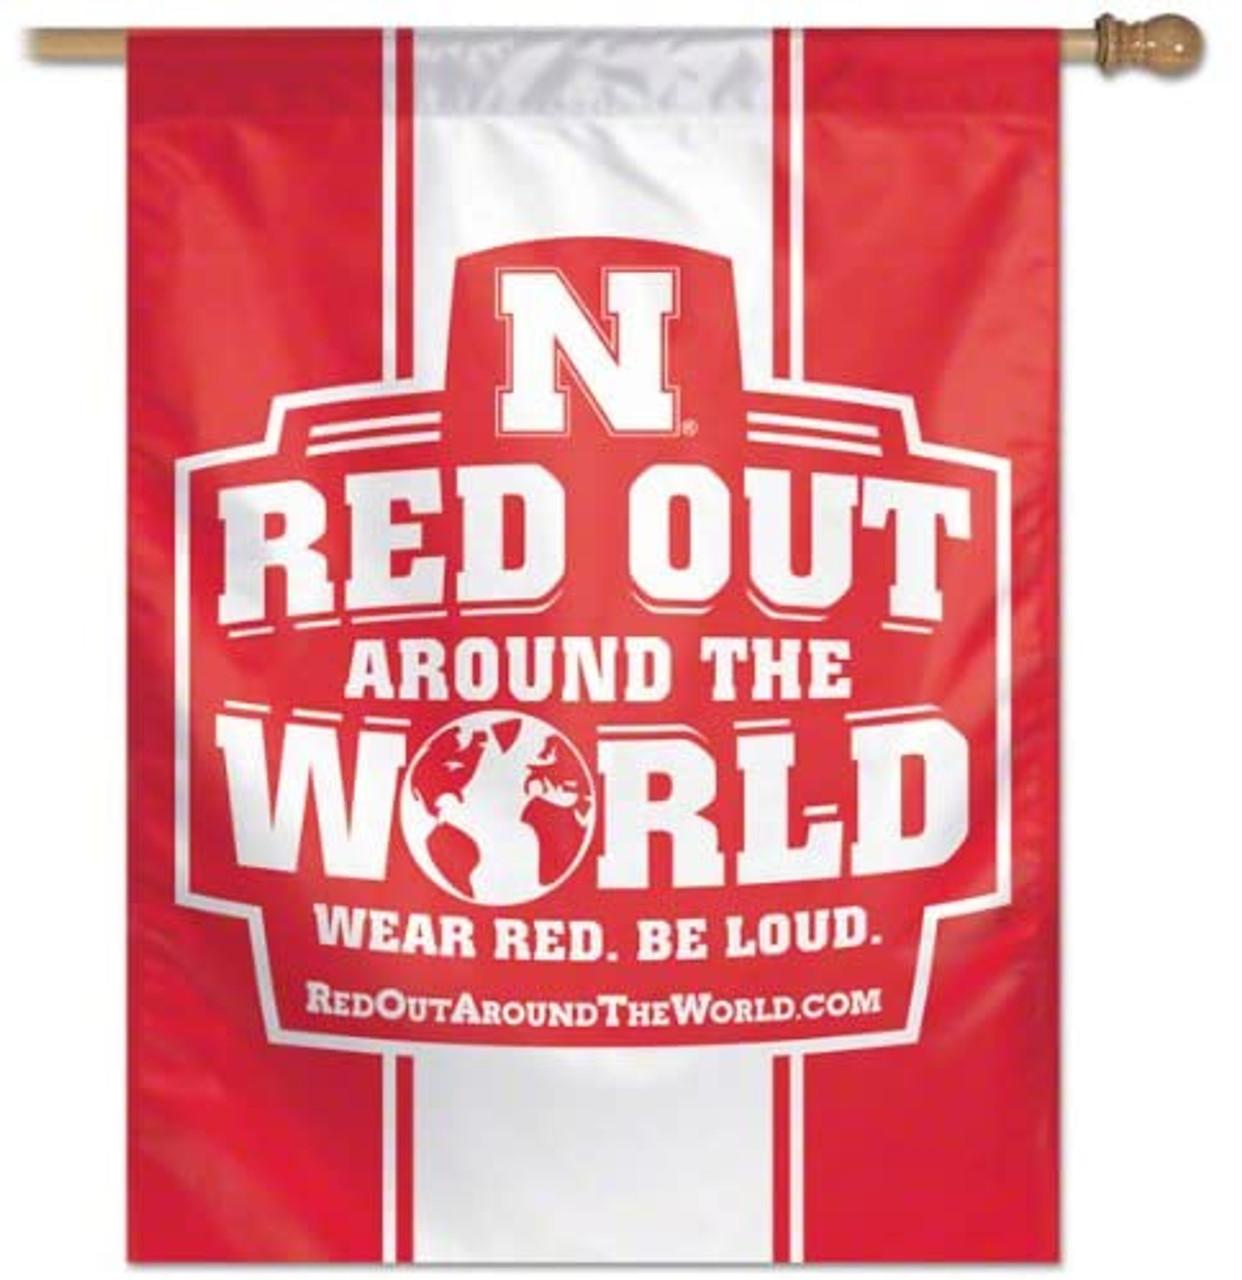 Nebraska Cornhuskers Banner 27x37 Vertical Red Out